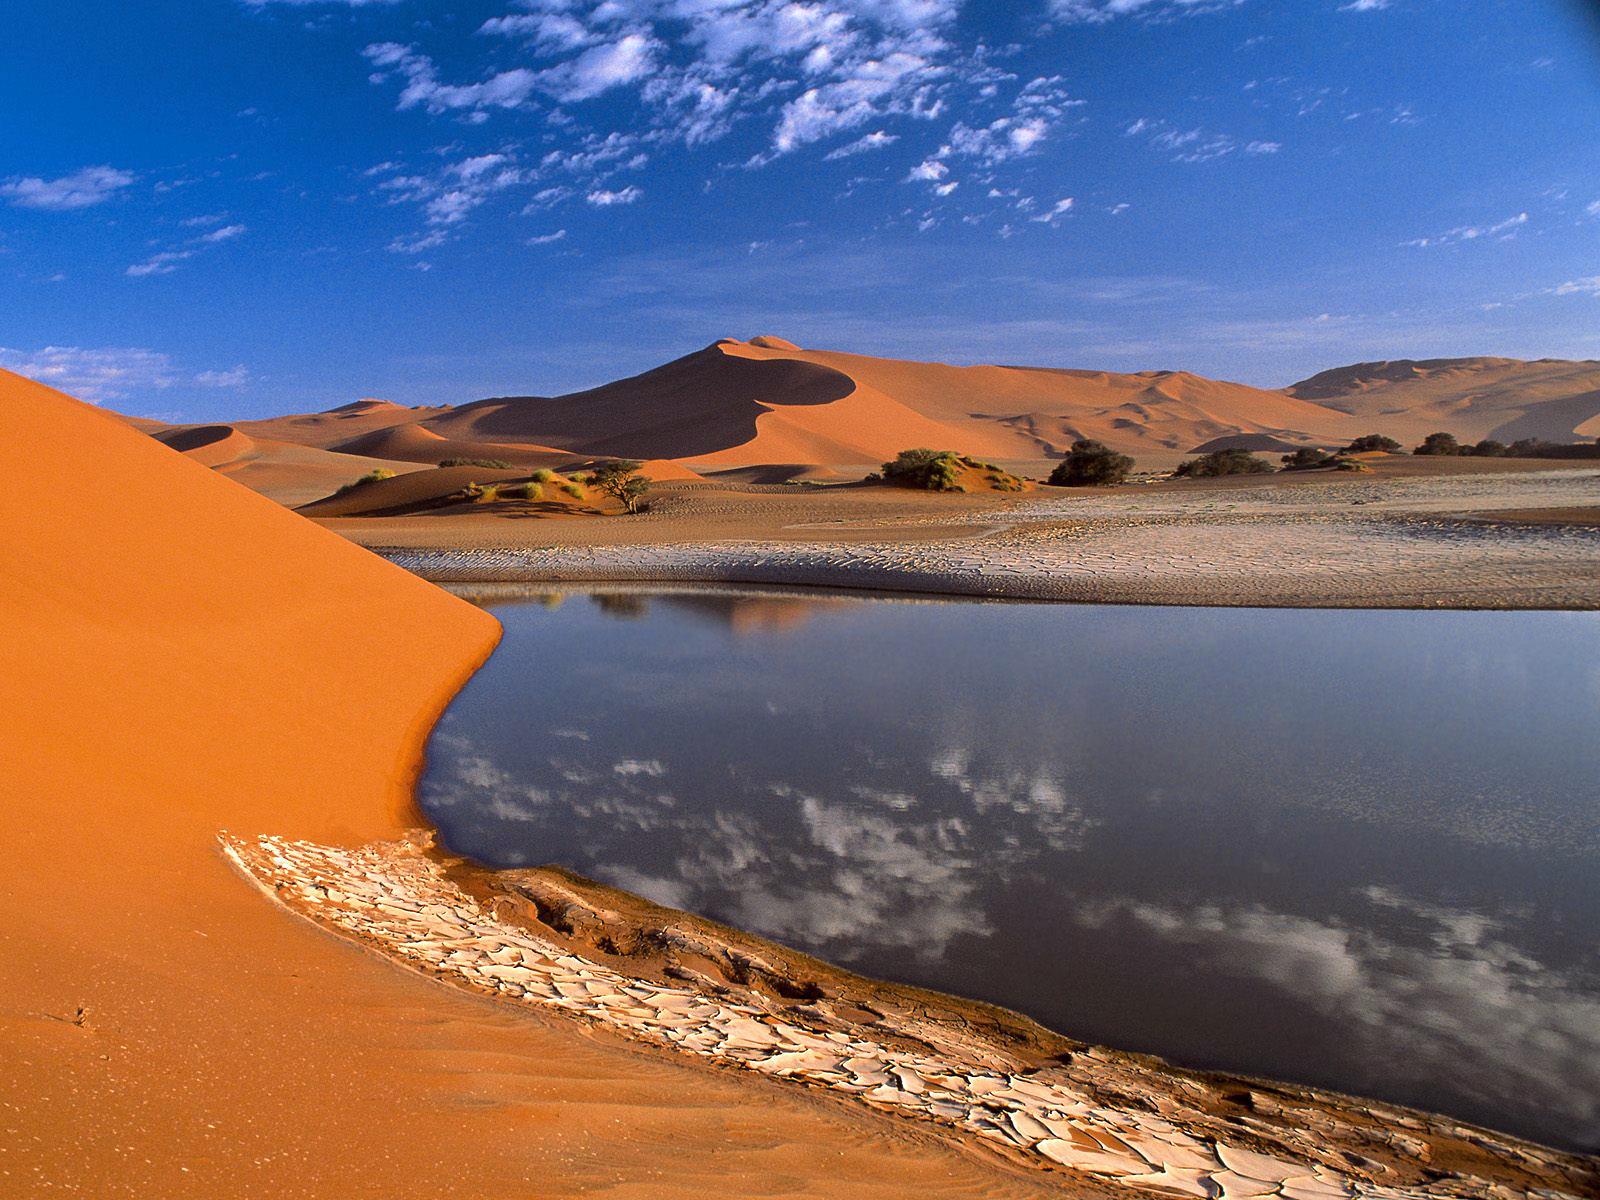 43+ Desert Oasis Wallpaper on WallpaperSafari